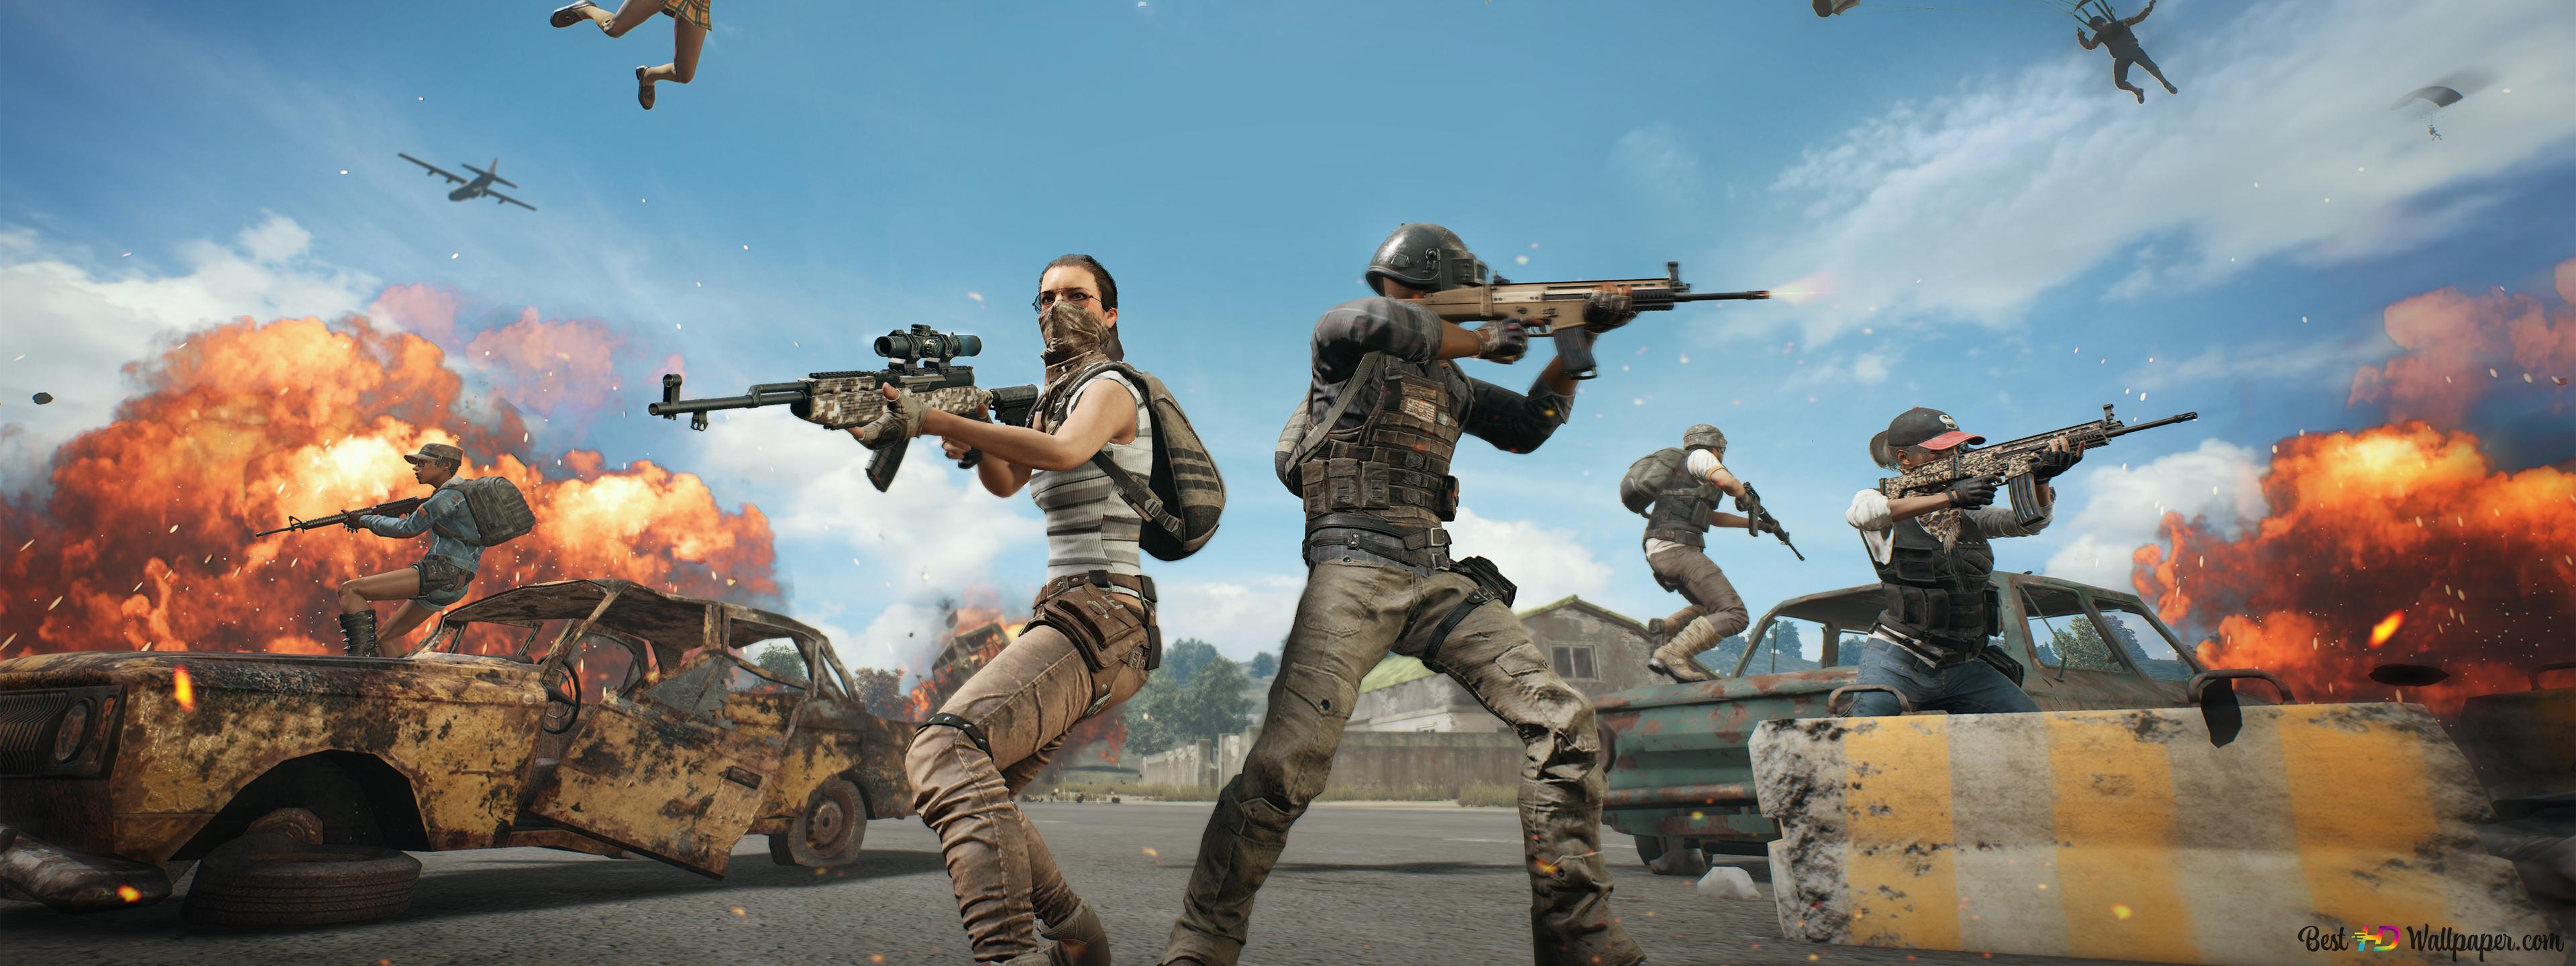 Pubg Playerunknown S Battlegrounds Team Conflict Hd Wallpaper